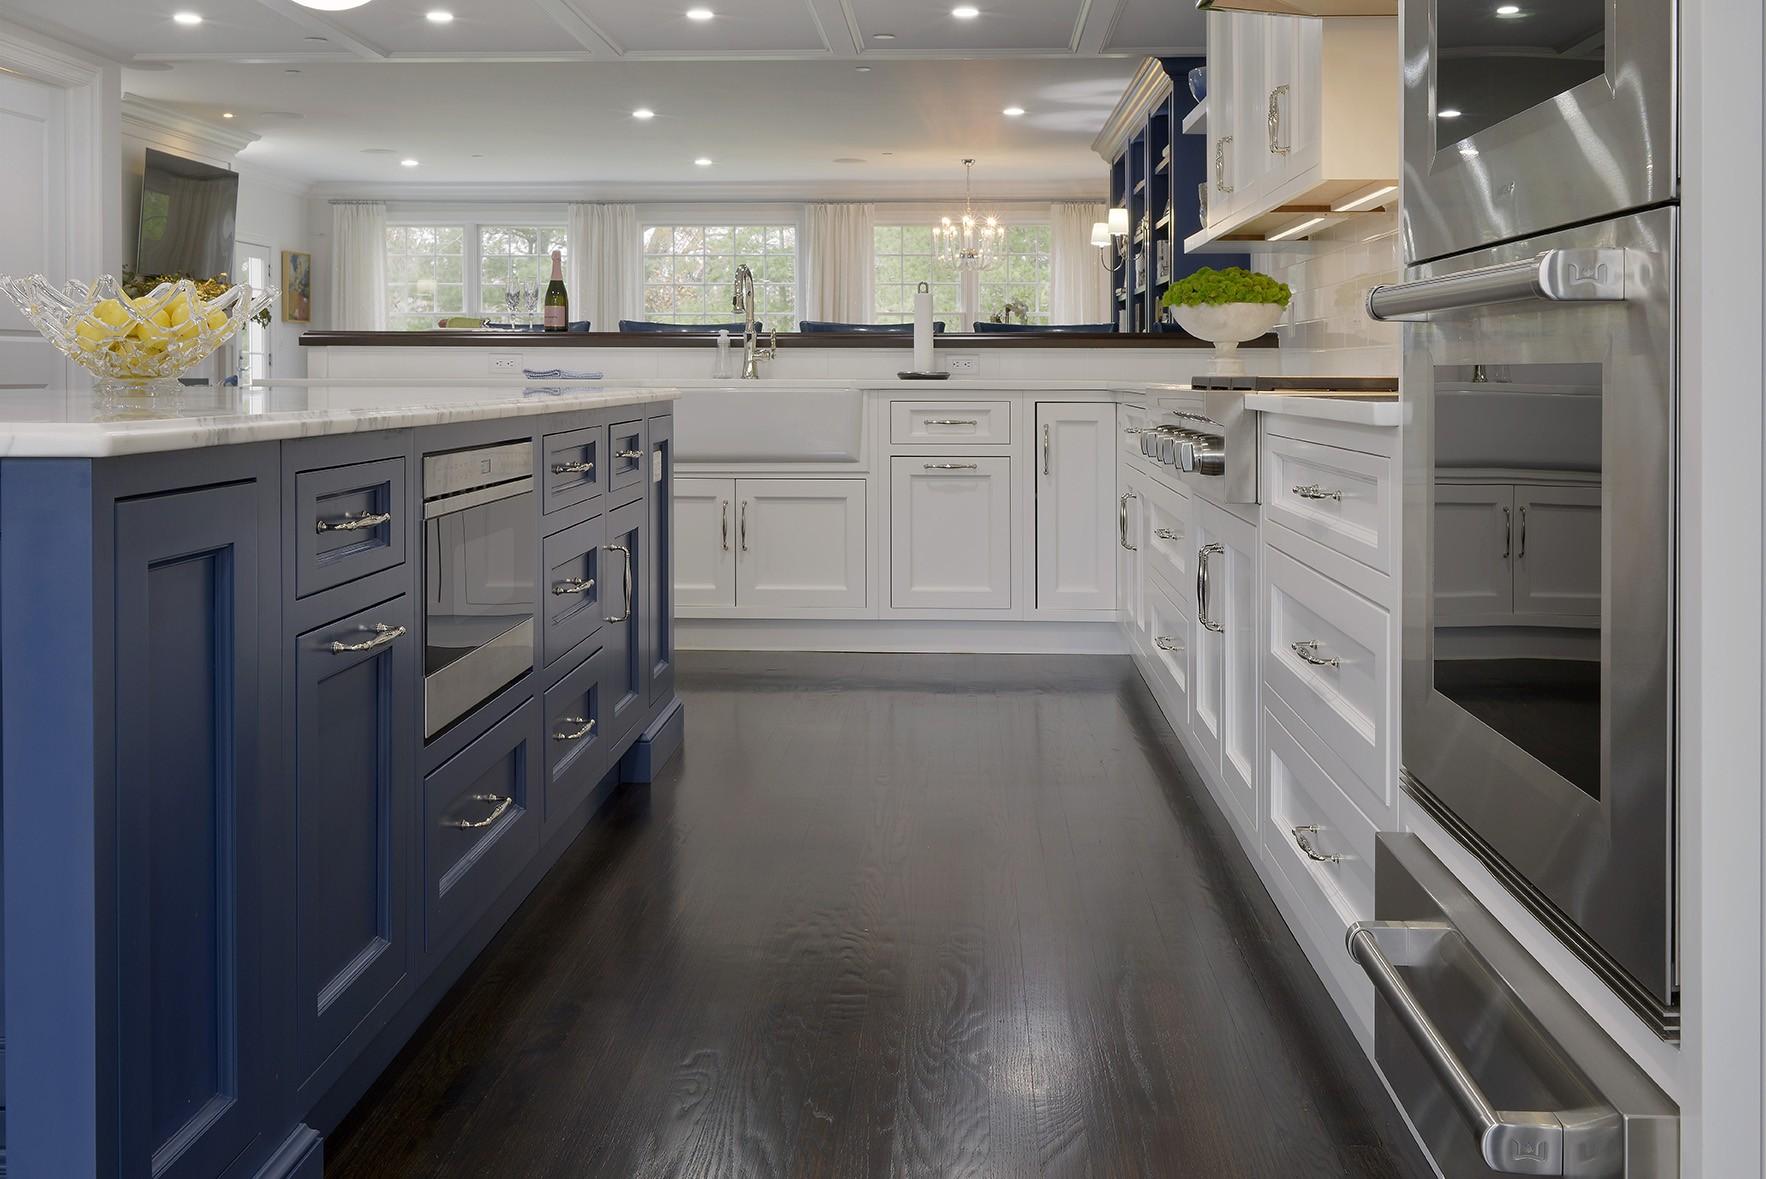 Majestic Kitchens & Bath | LinkedIn